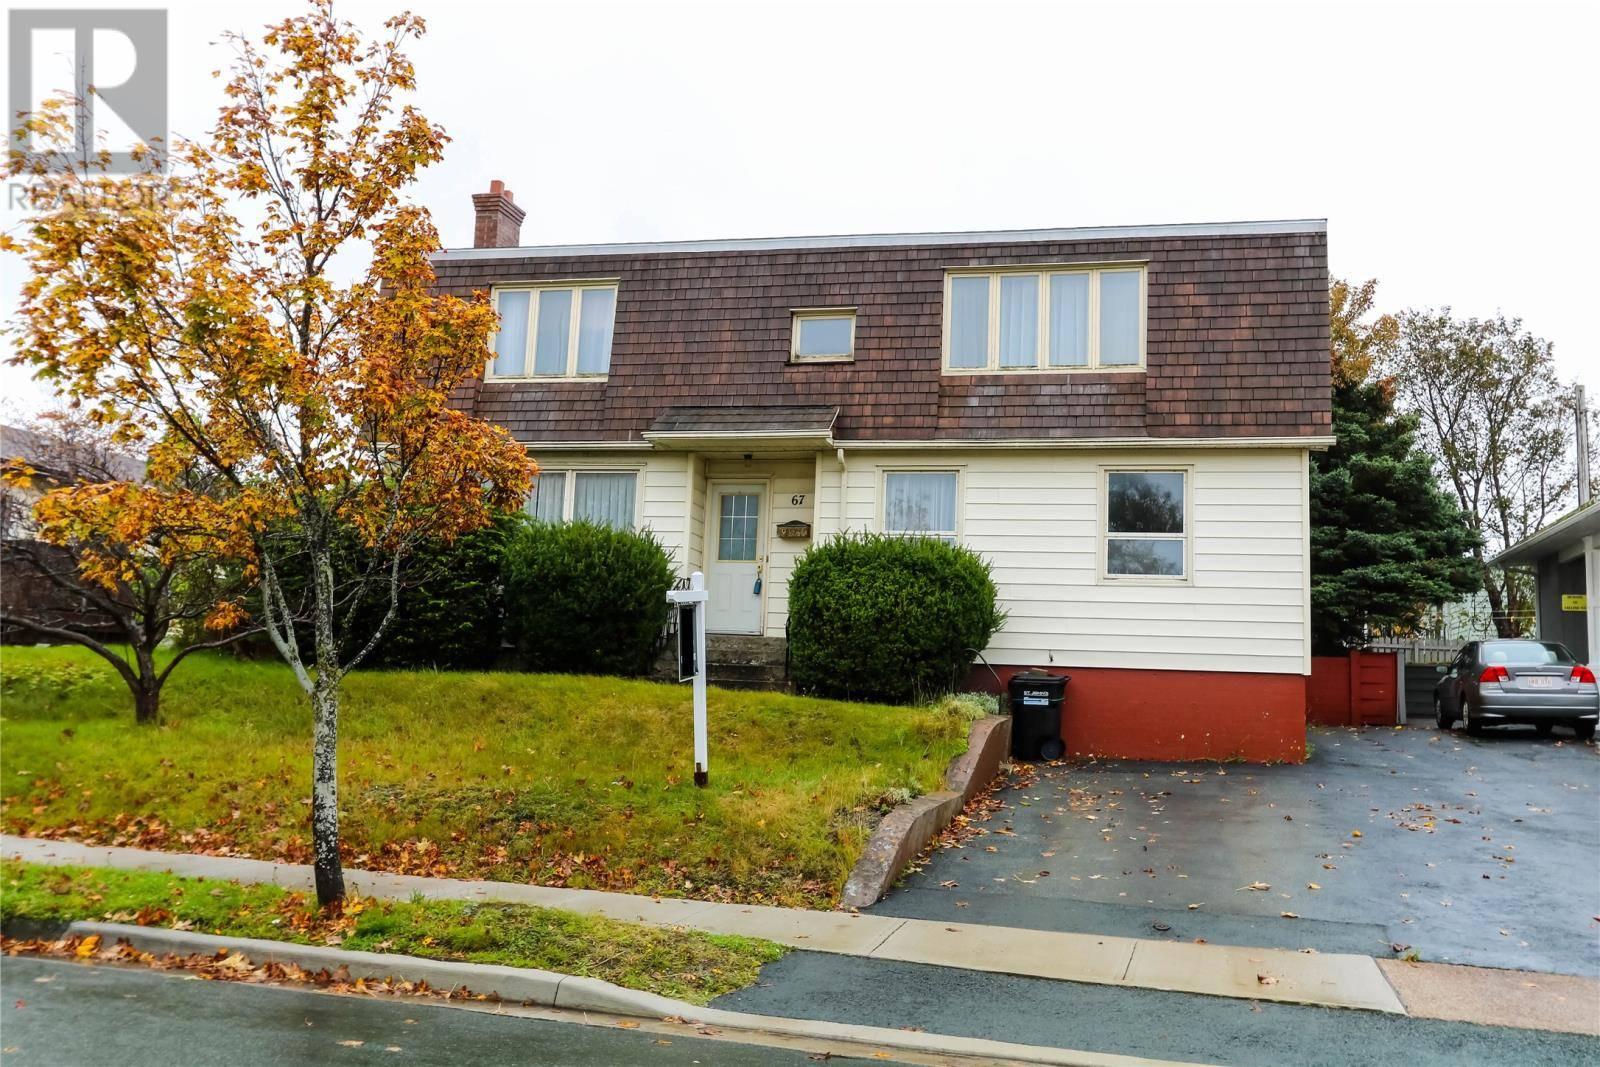 House for sale at 67 O'regan Rd St. John's Newfoundland - MLS: 1205407